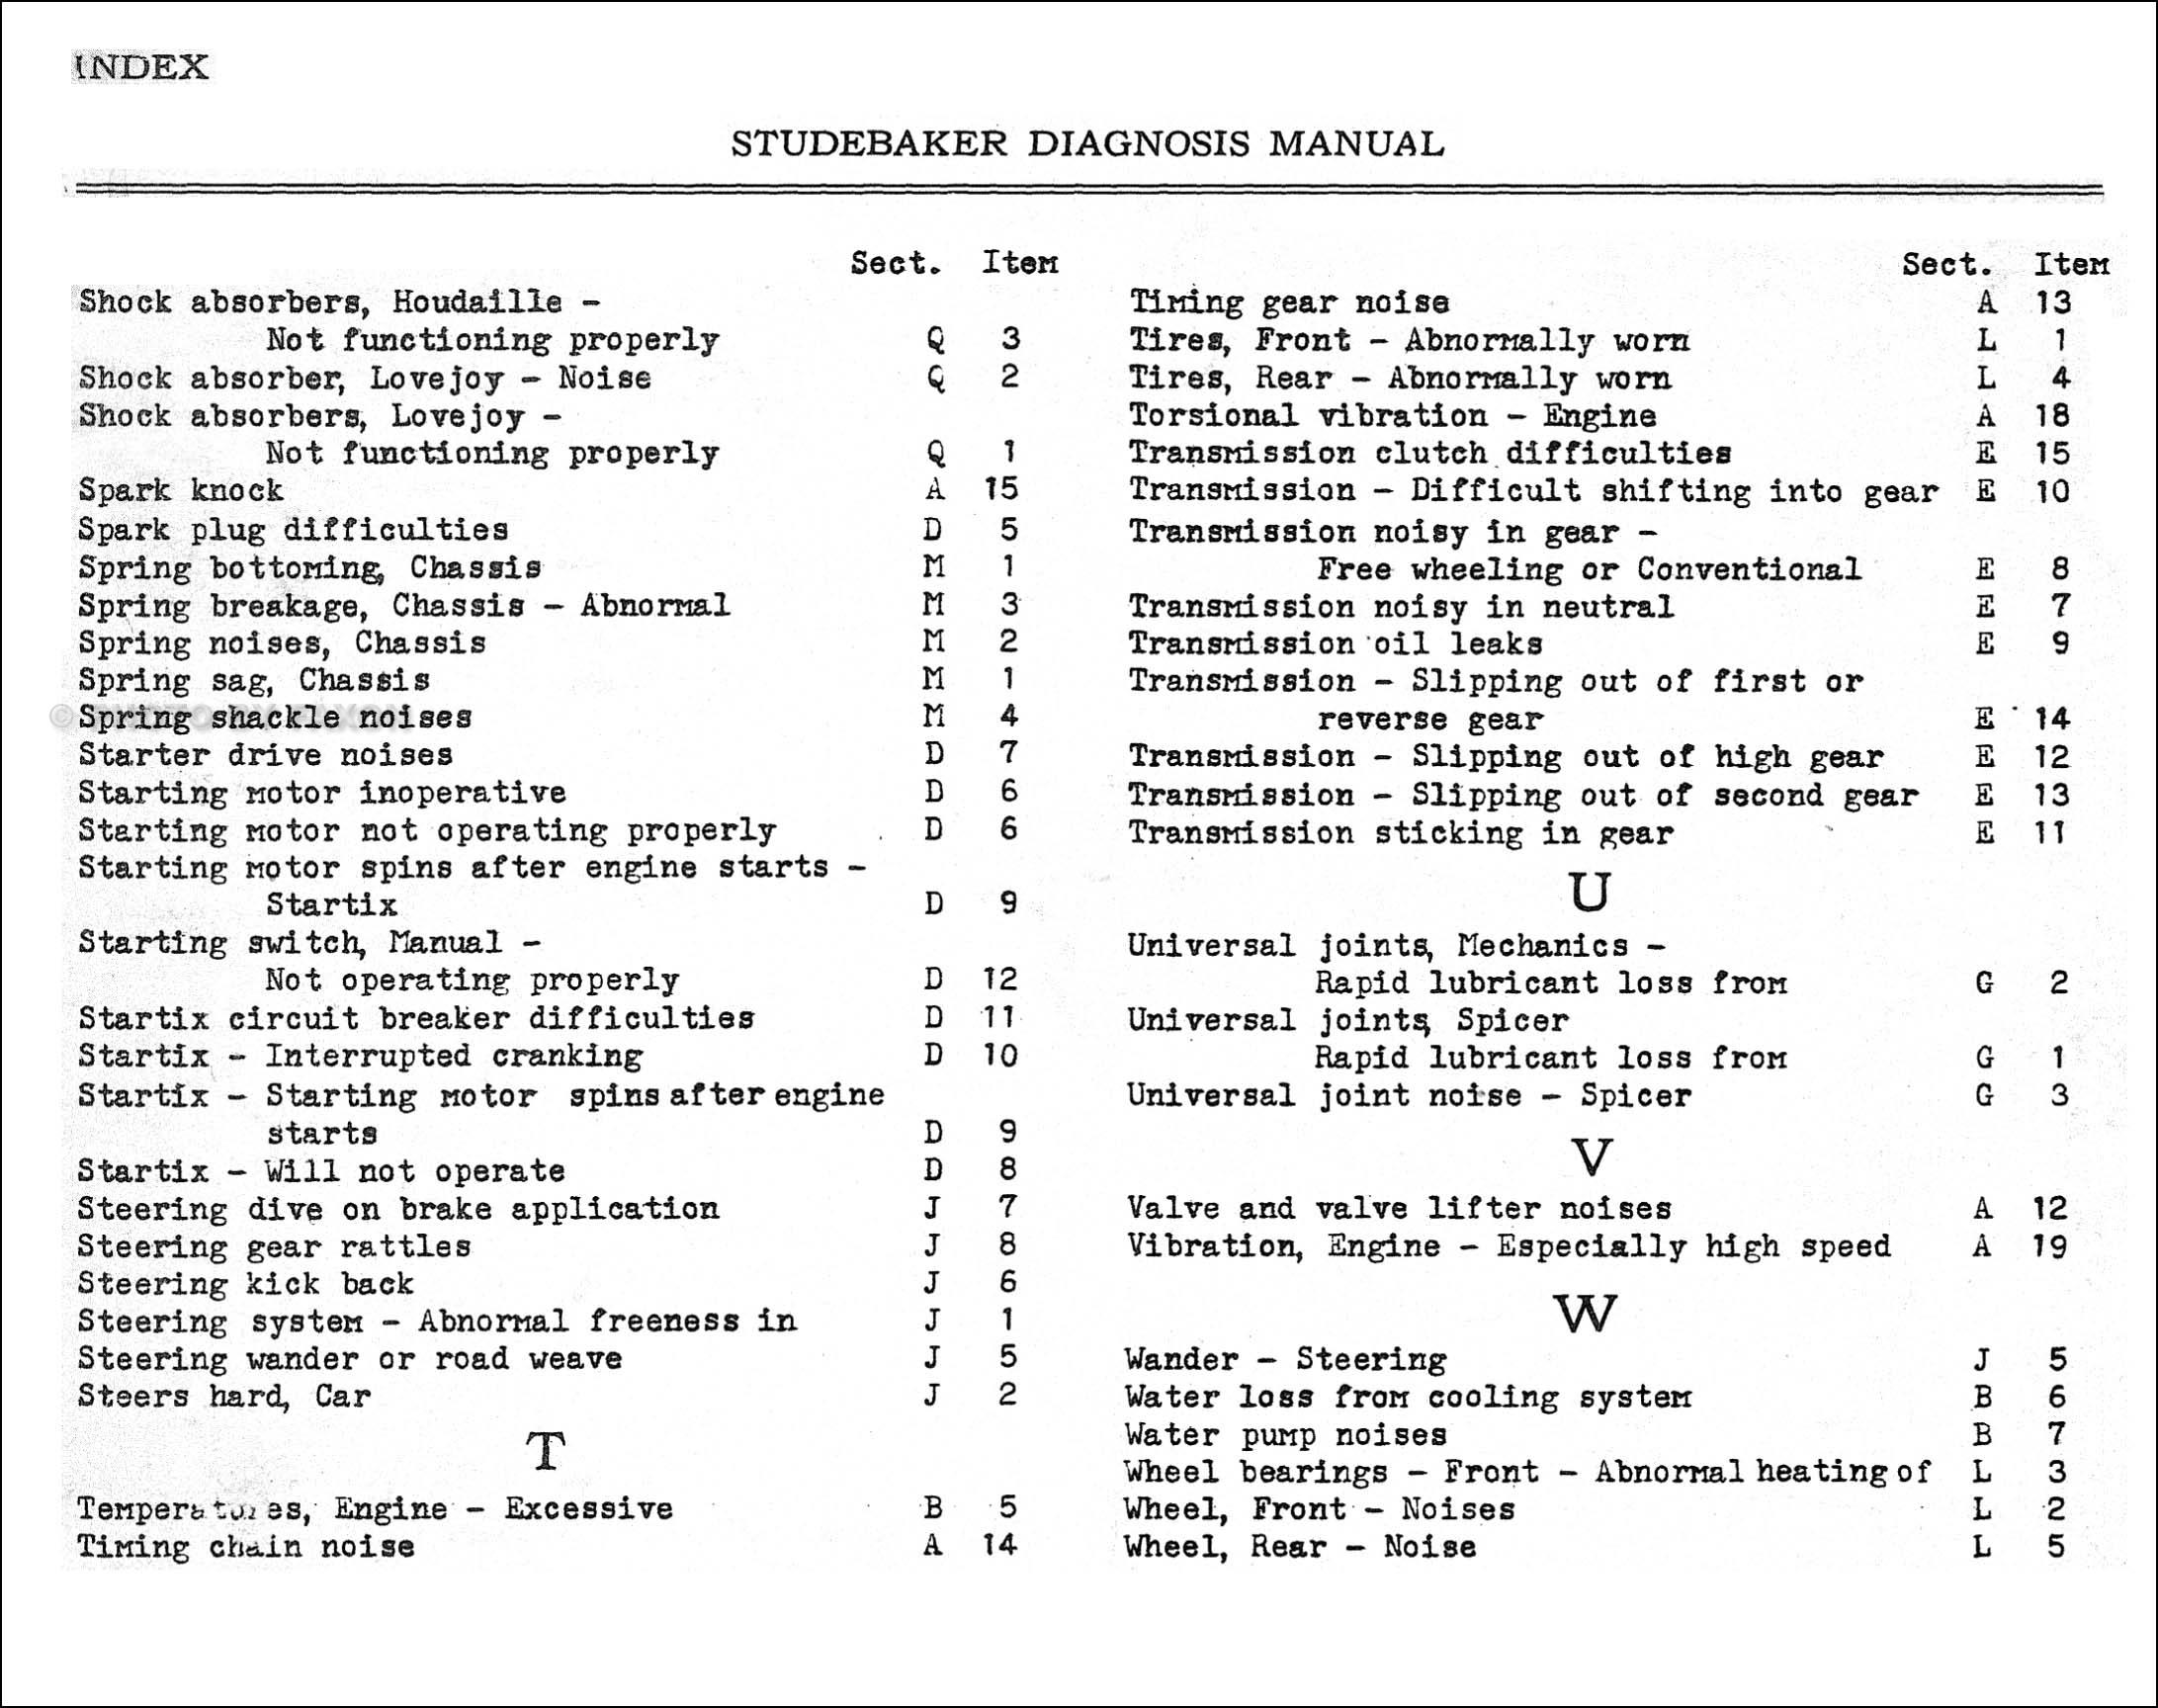 1934 studebaker service manual reprint dictator commander. Black Bedroom Furniture Sets. Home Design Ideas